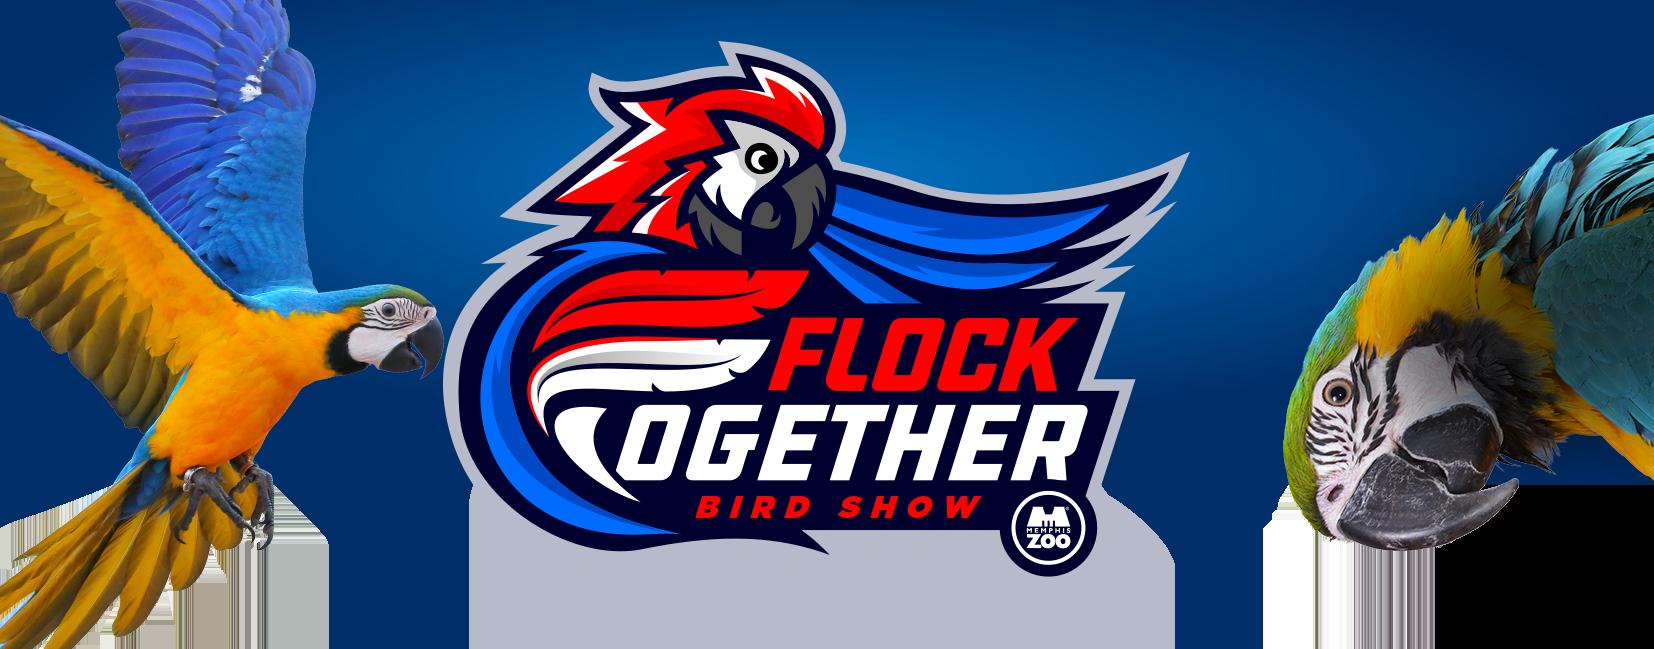 Bird show logo